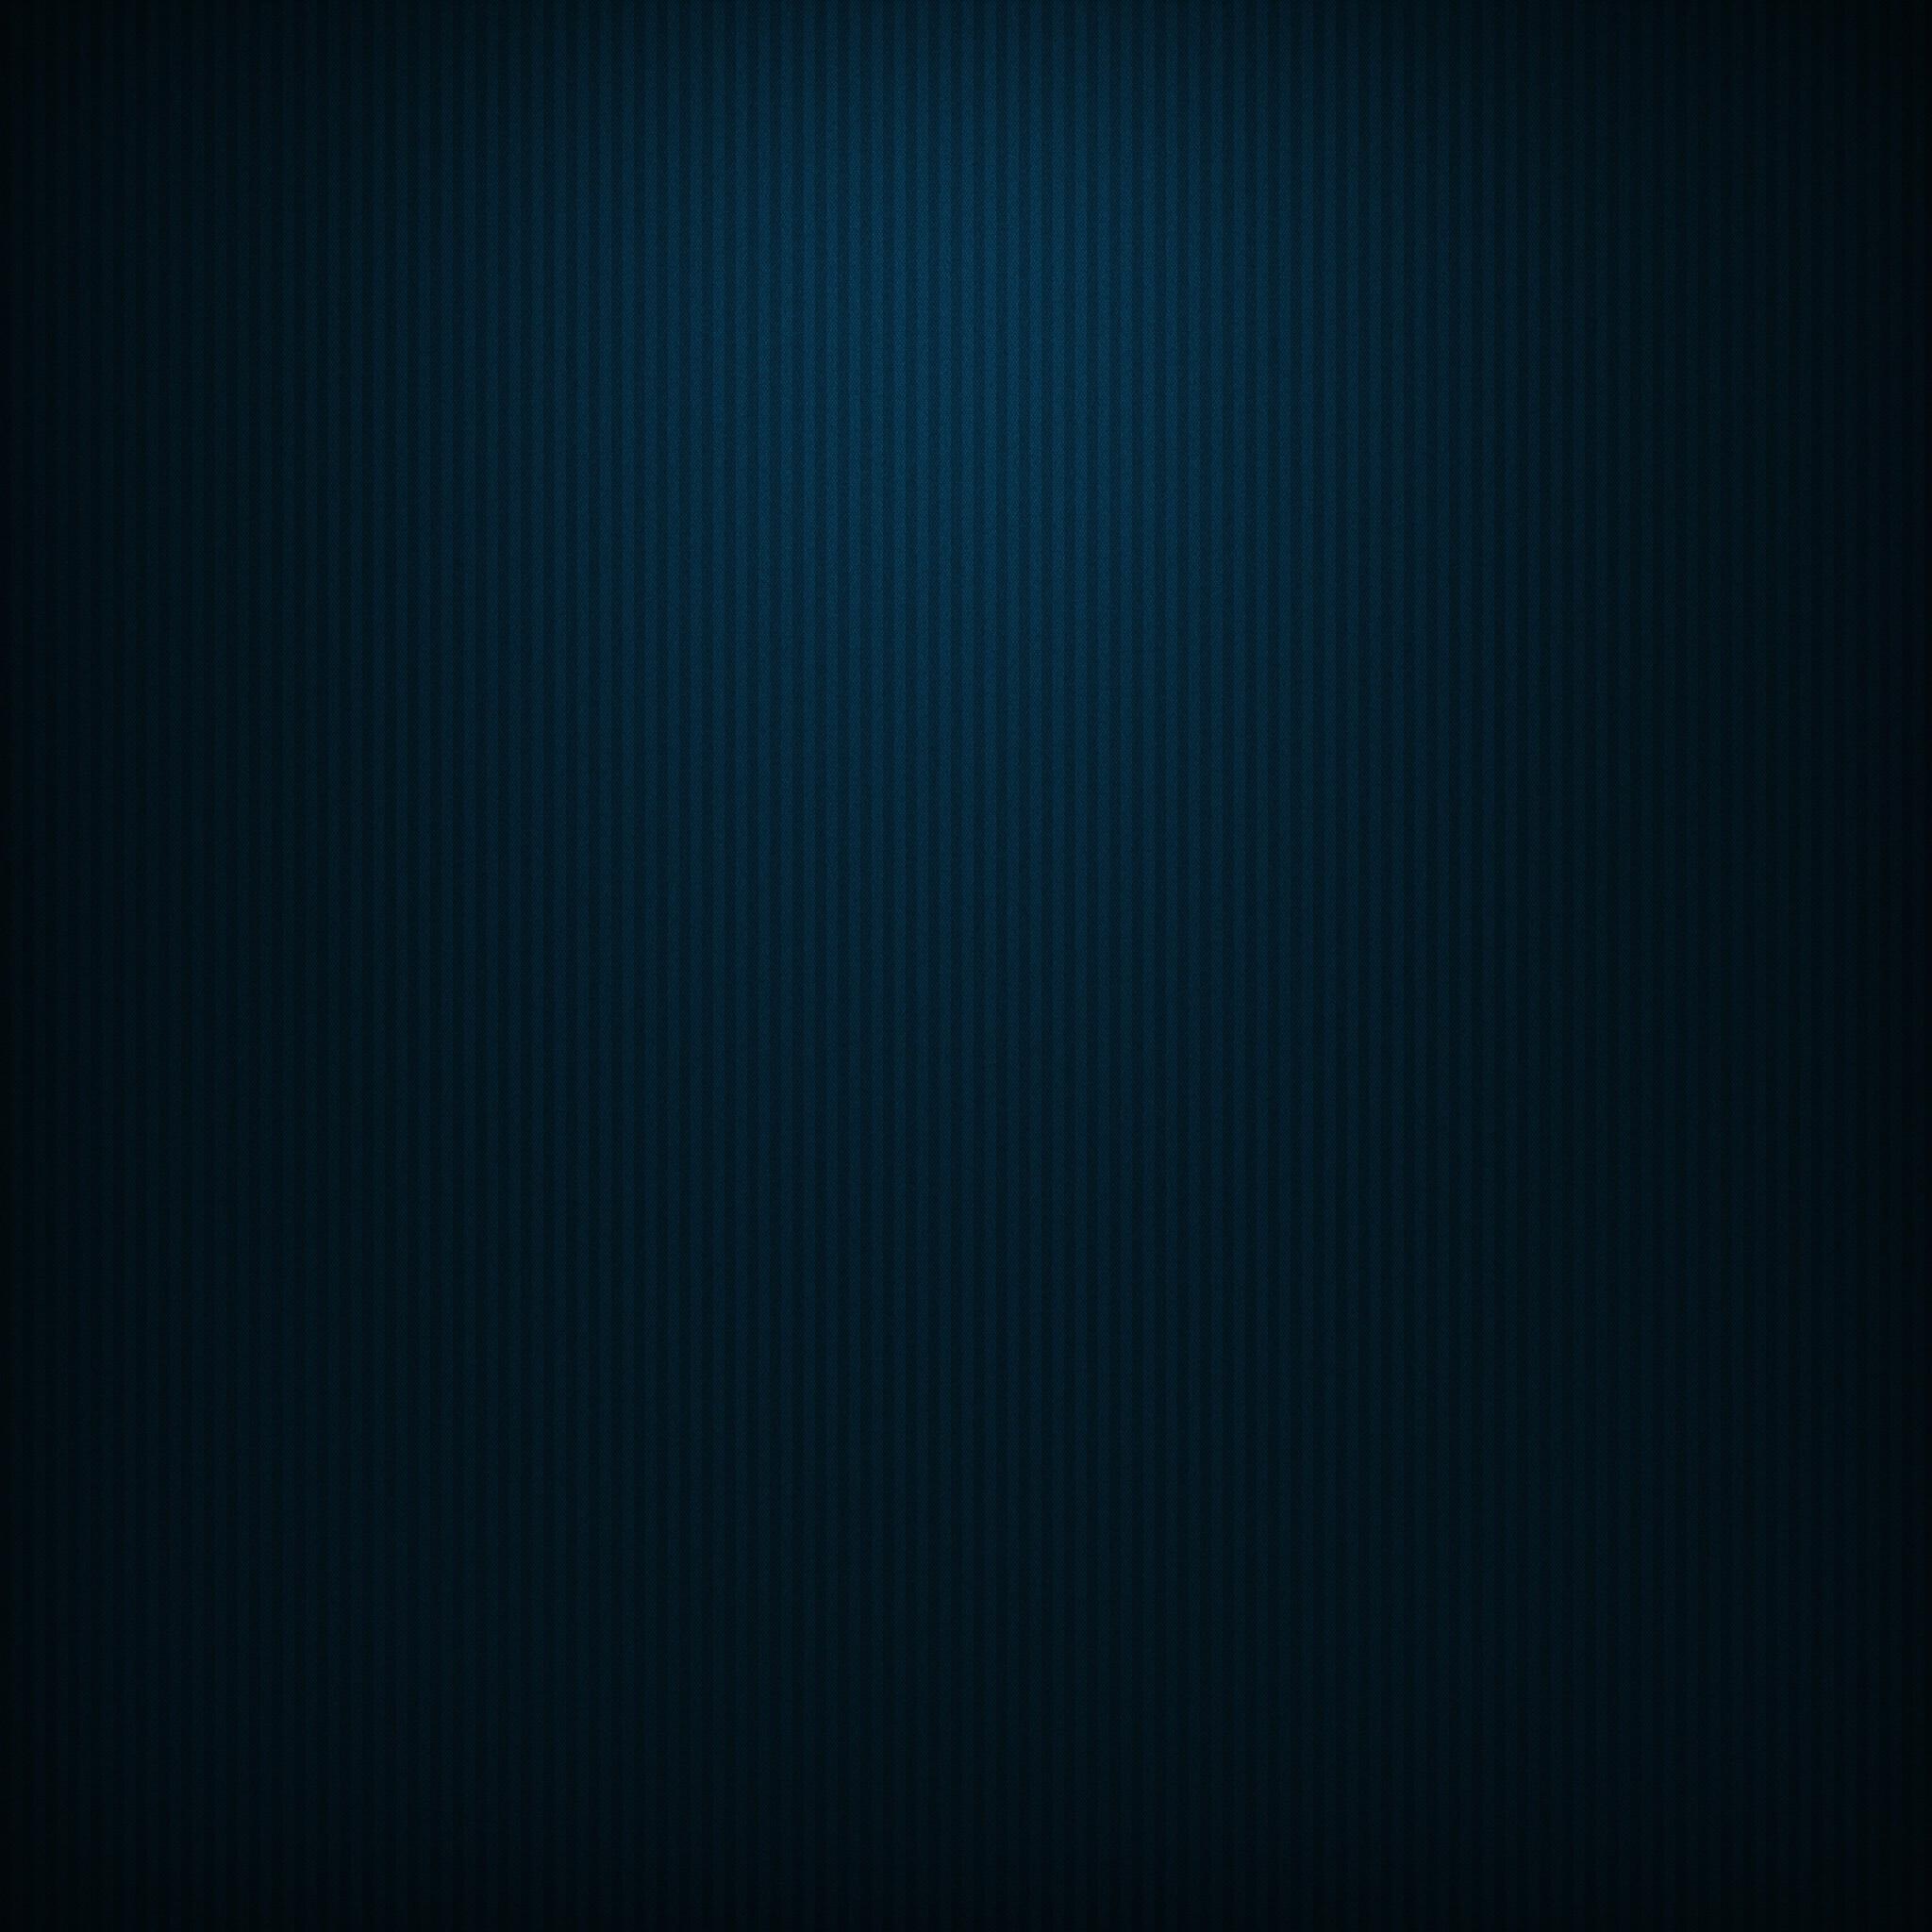 iPhone 6 Wallpaper Retina – Bing images